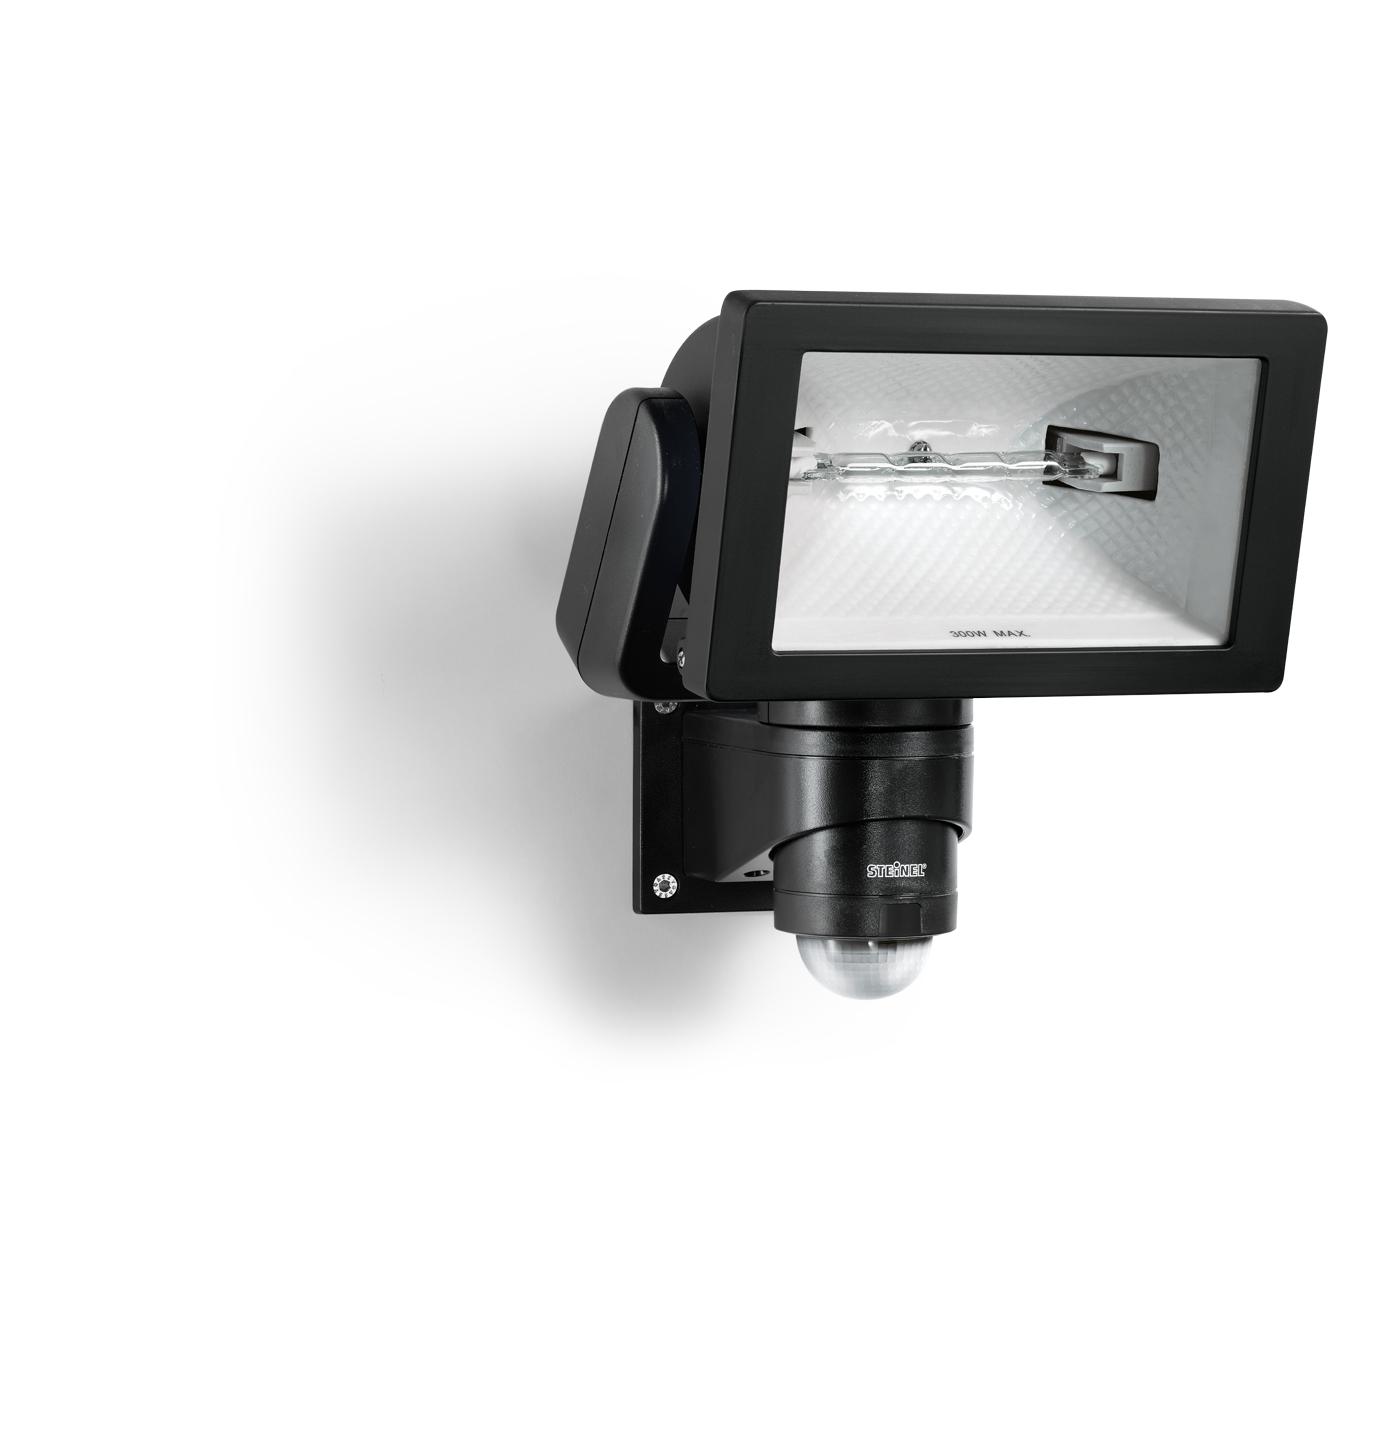 Steinel sensor halogenstrahler hs 300 duo schwarz 633219 for Hausfronten modern